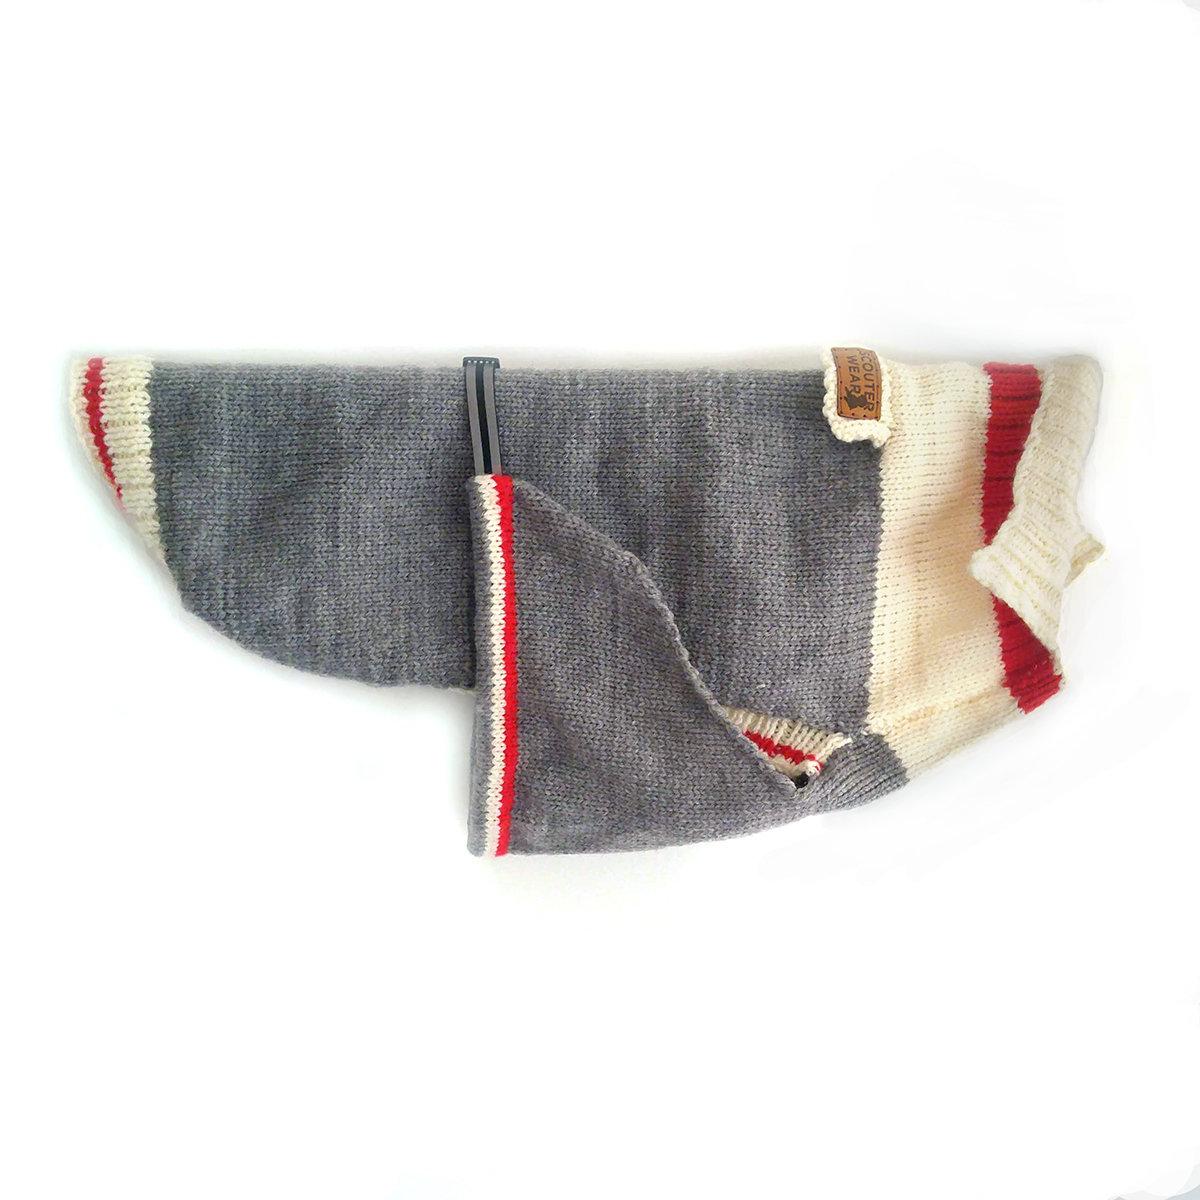 The Sock Monkey Sweater